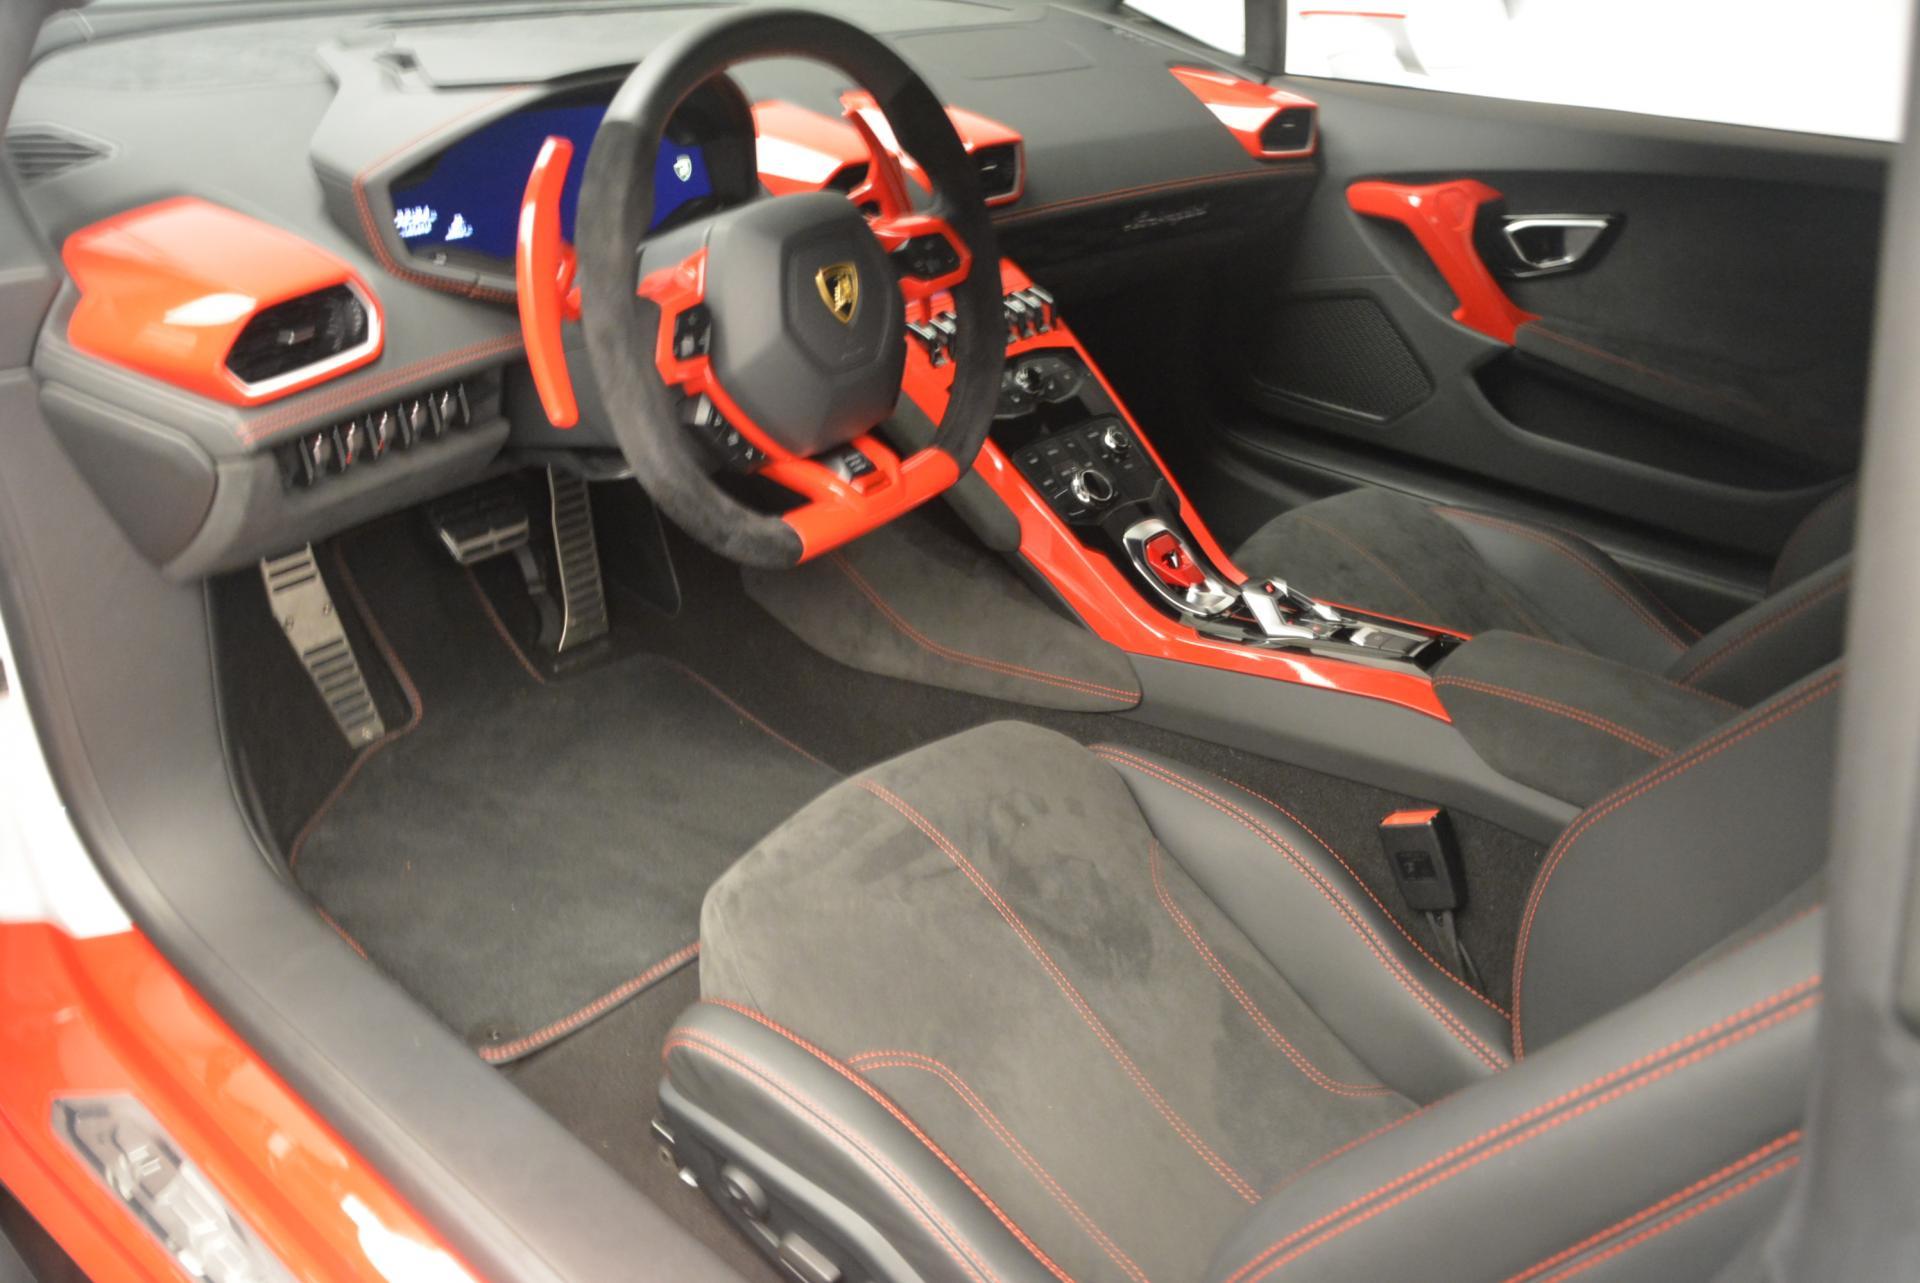 Used 2015 Lamborghini Huracan LP610-4 For Sale In Greenwich, CT 114_p14